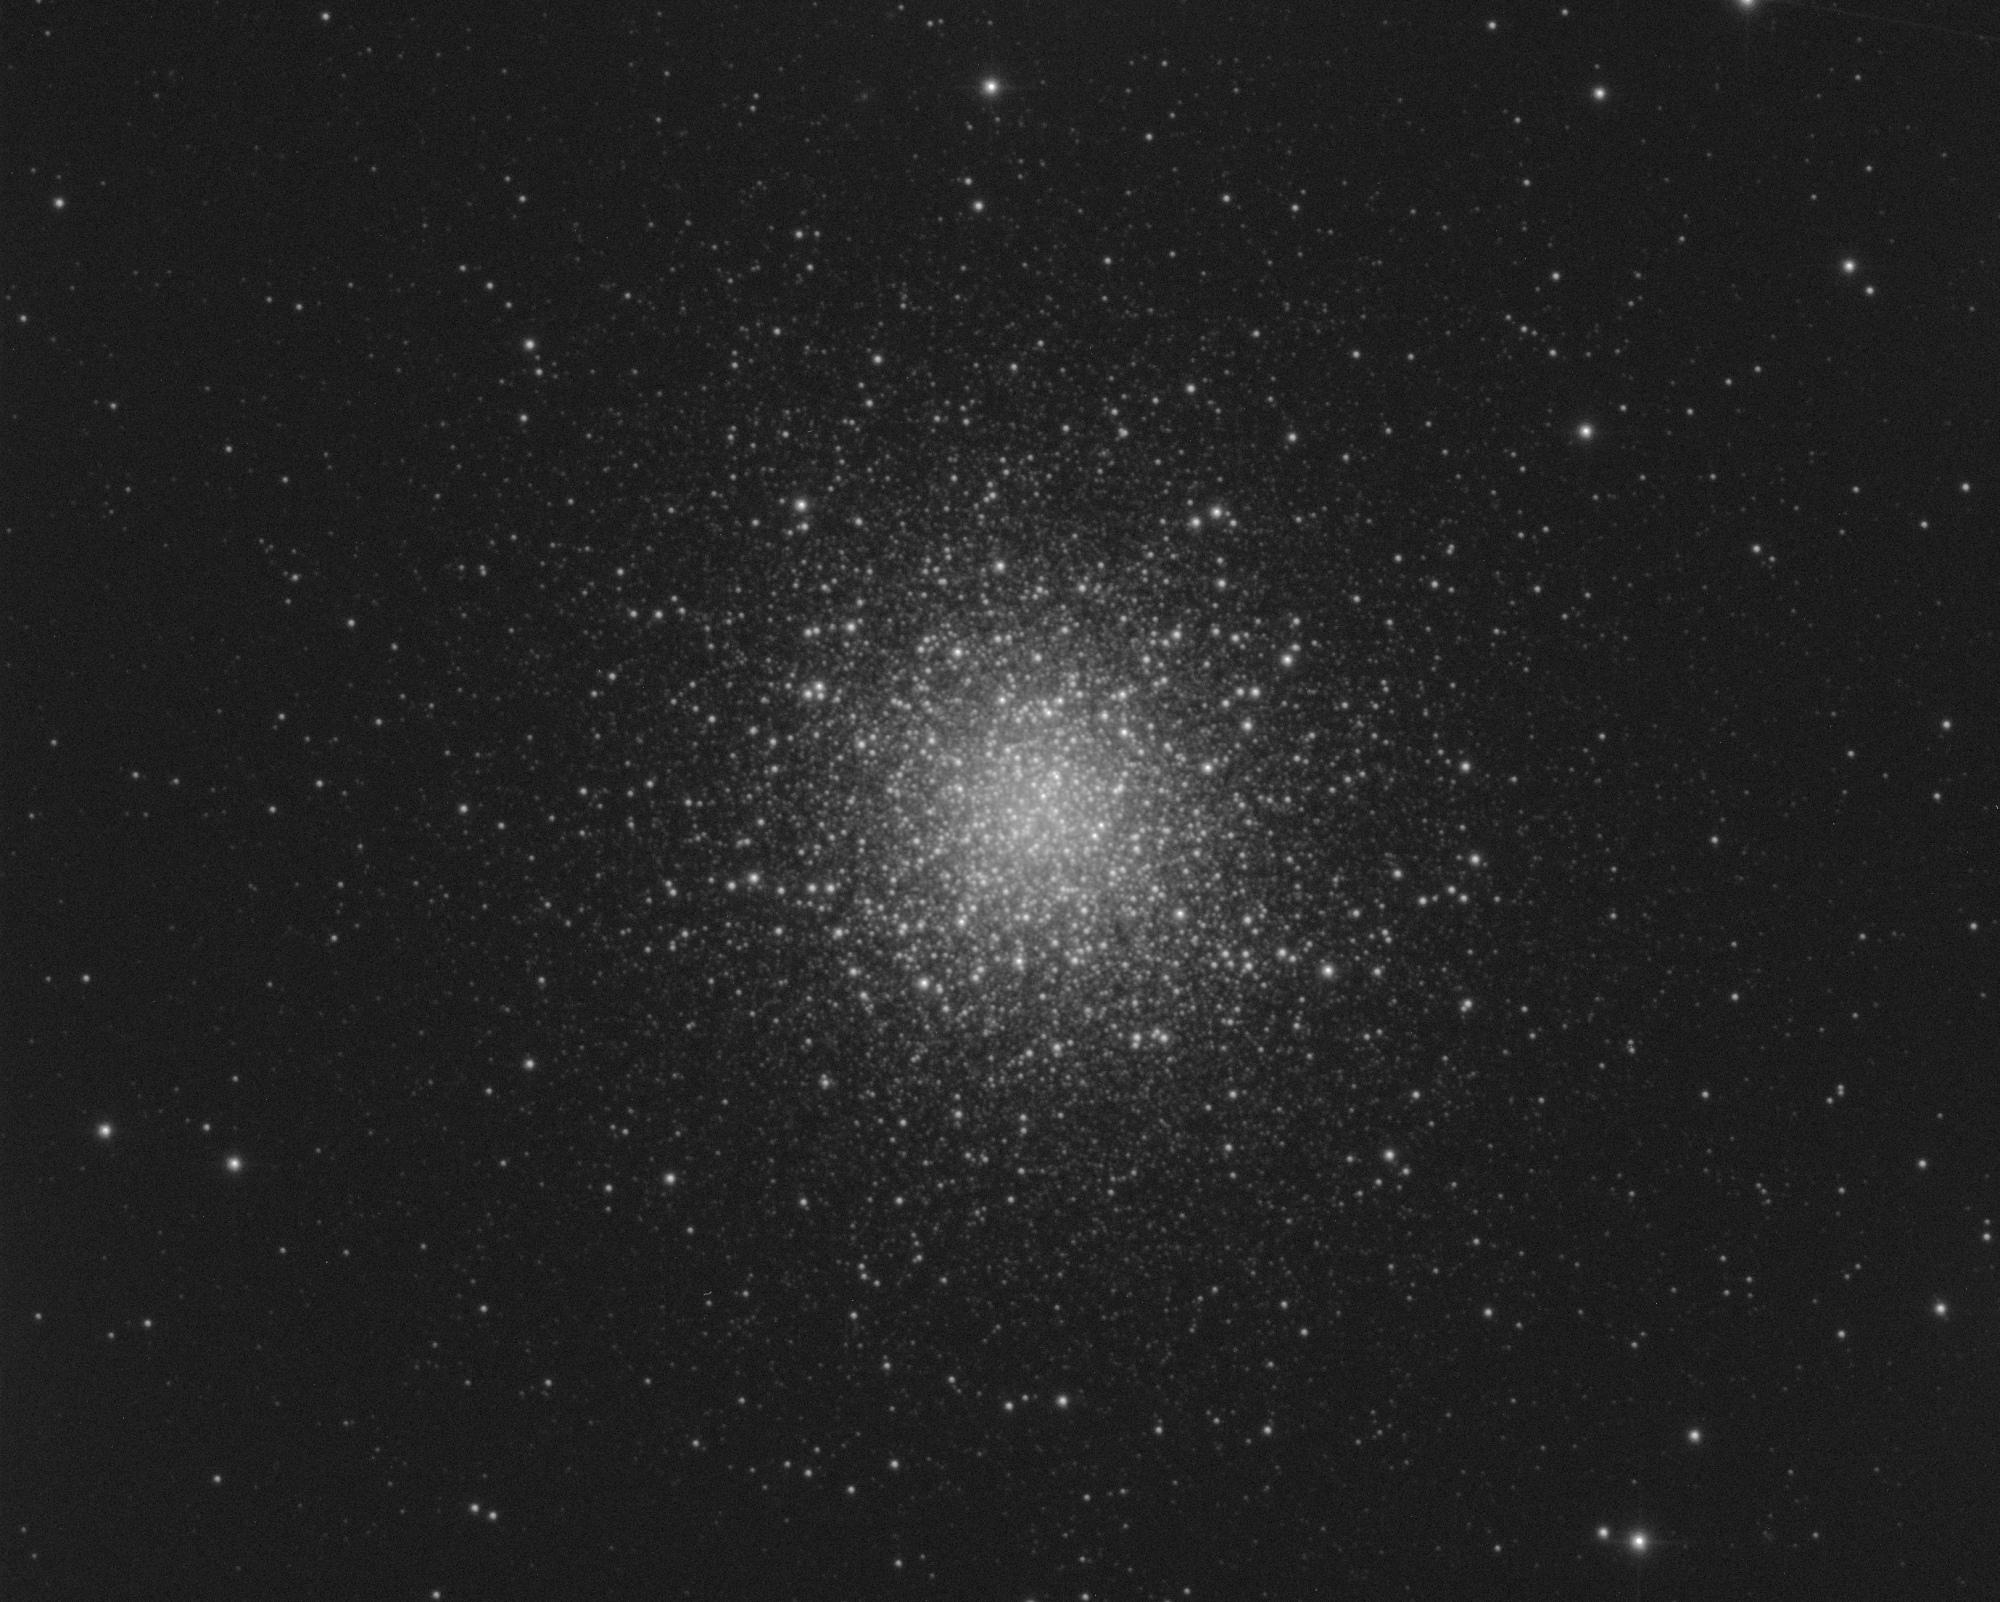 M13_Light_Red_300s_1x1_W_-16.20278.thumb.jpg.1aa1b4c4b96f495d276228267a7441fd.jpg